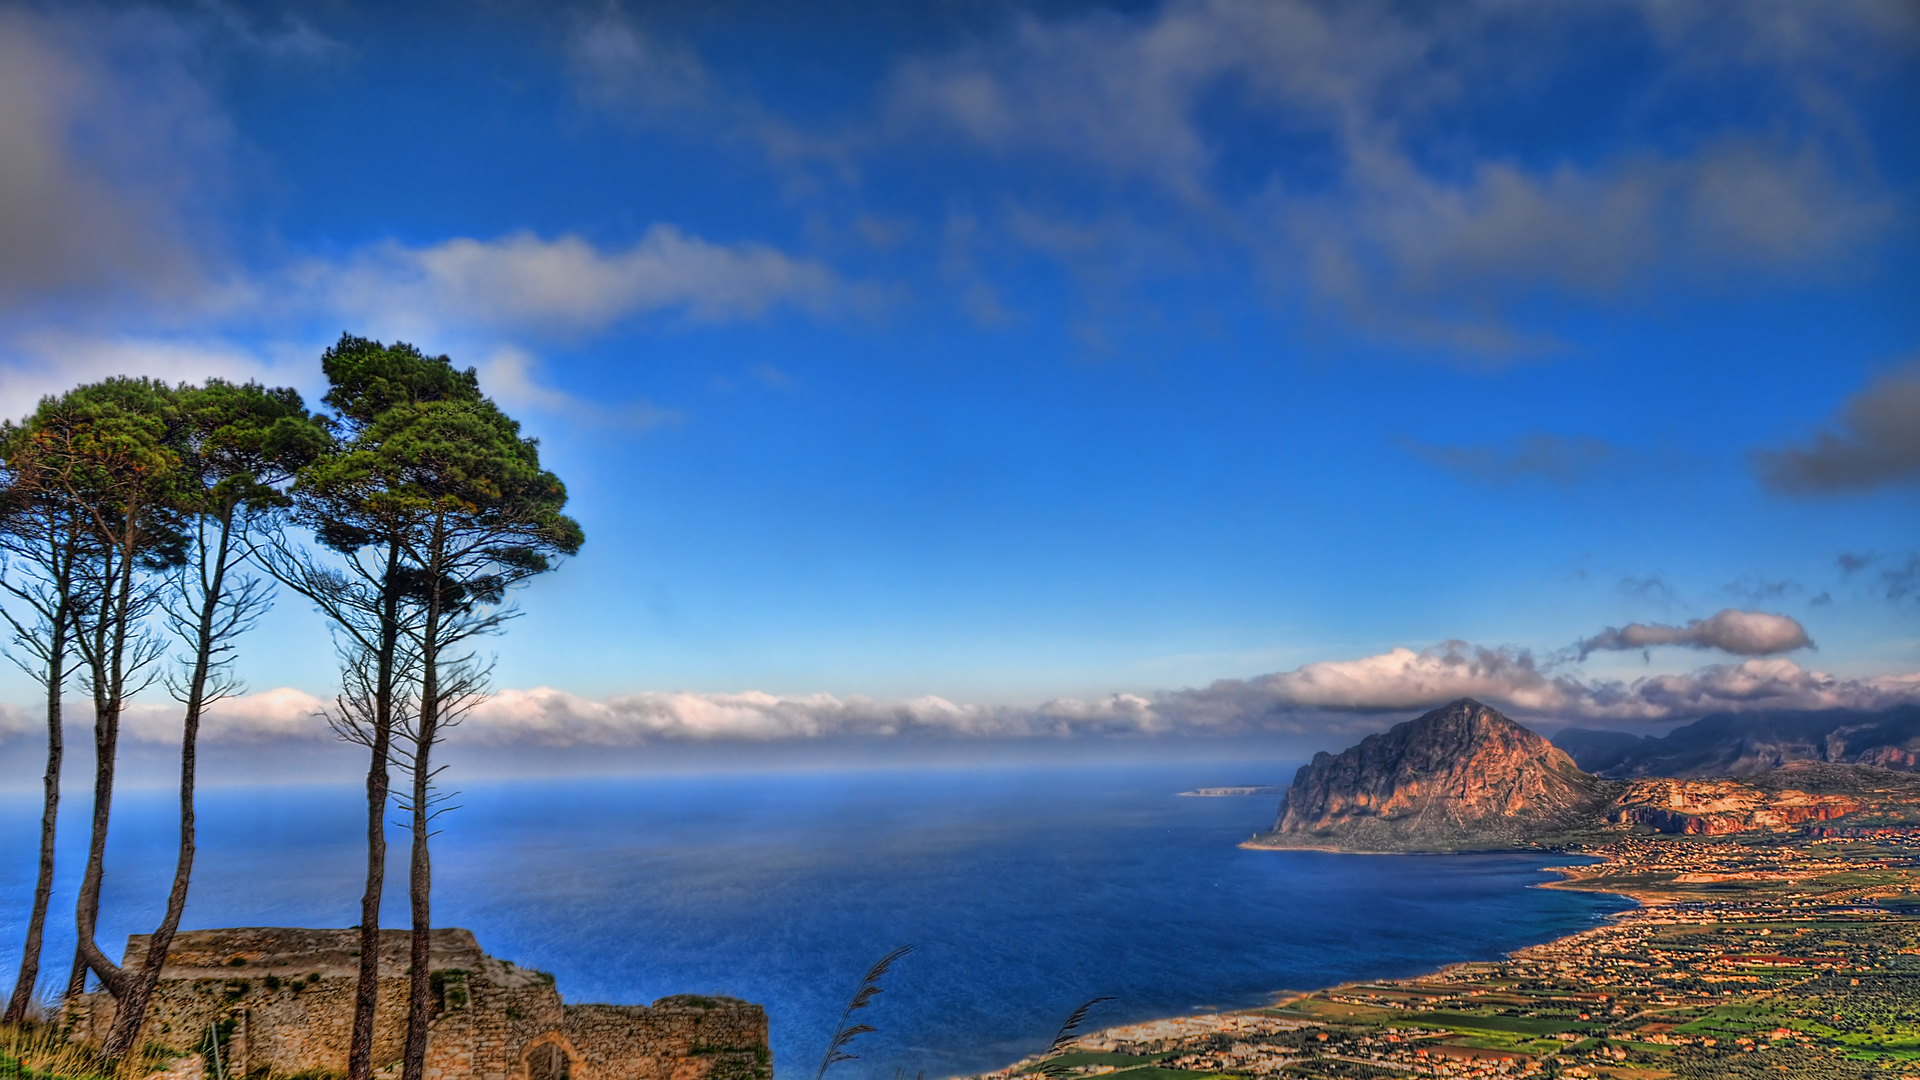 Gorgeous Coastal View Hdr Hd Desktop Background HD wallpapers